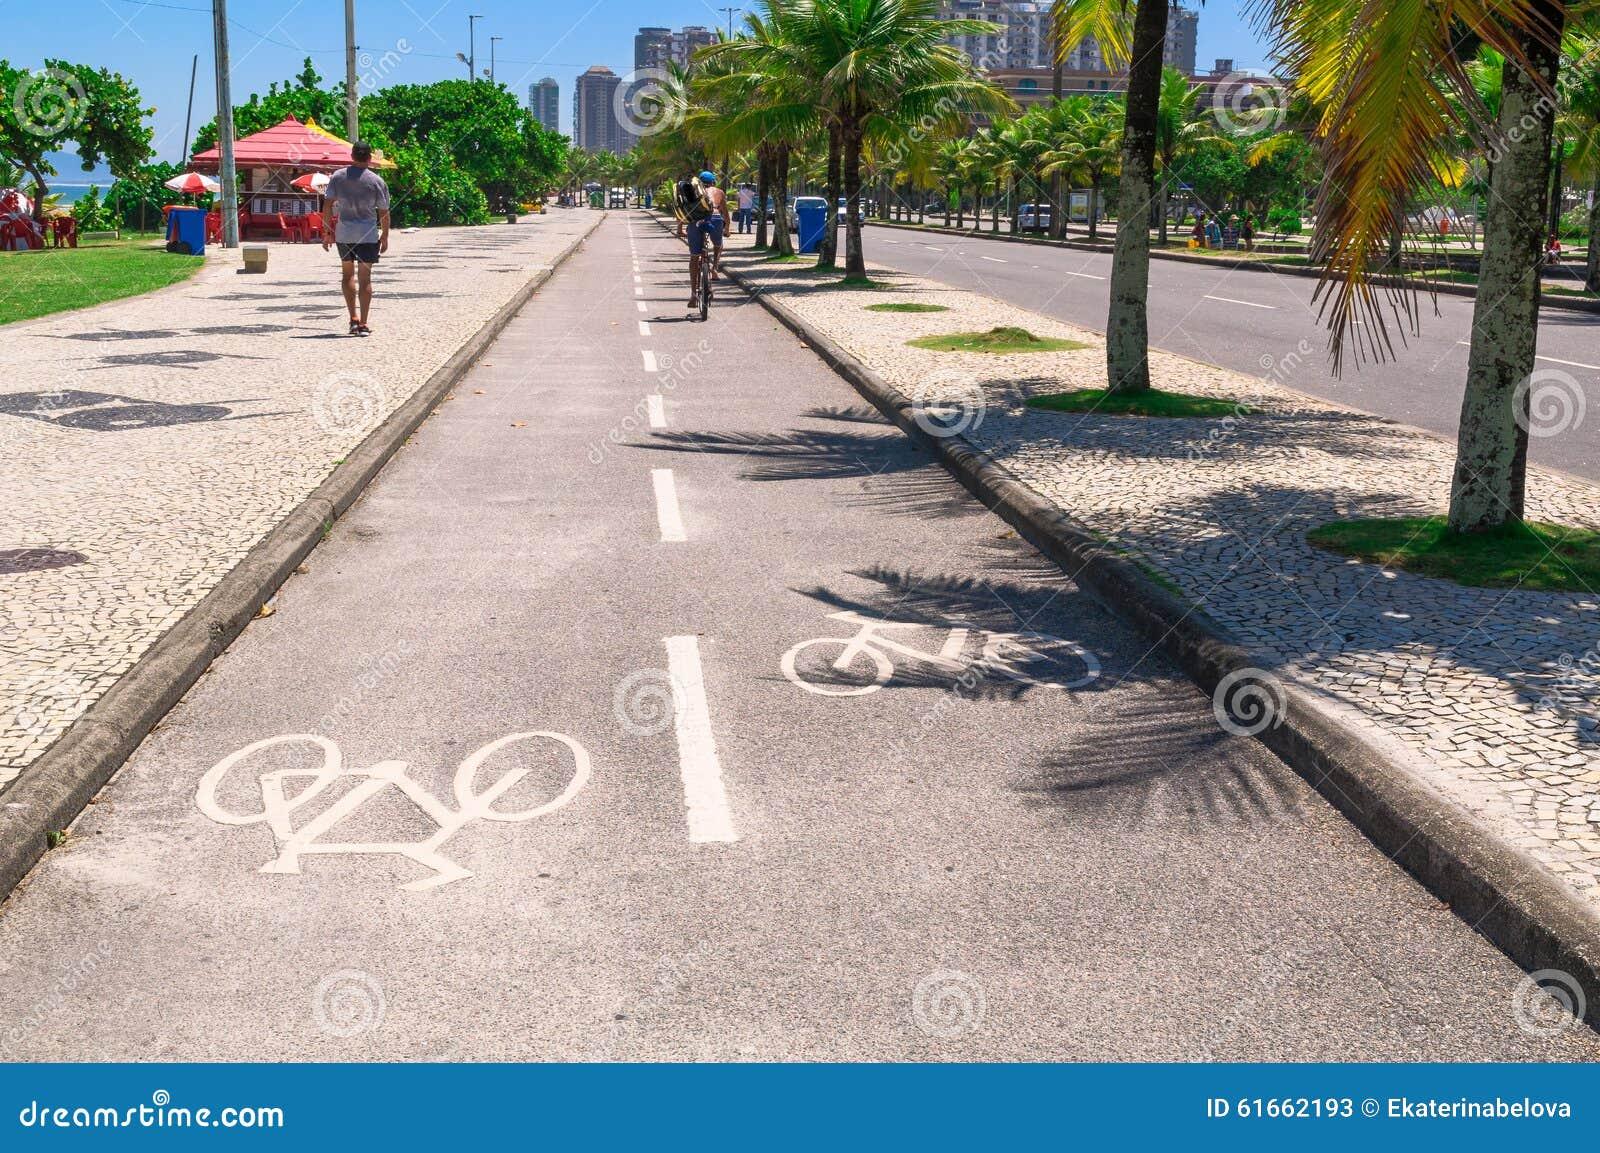 Bike path of seafront in Barra da Tijuca, Rio de Janeiro